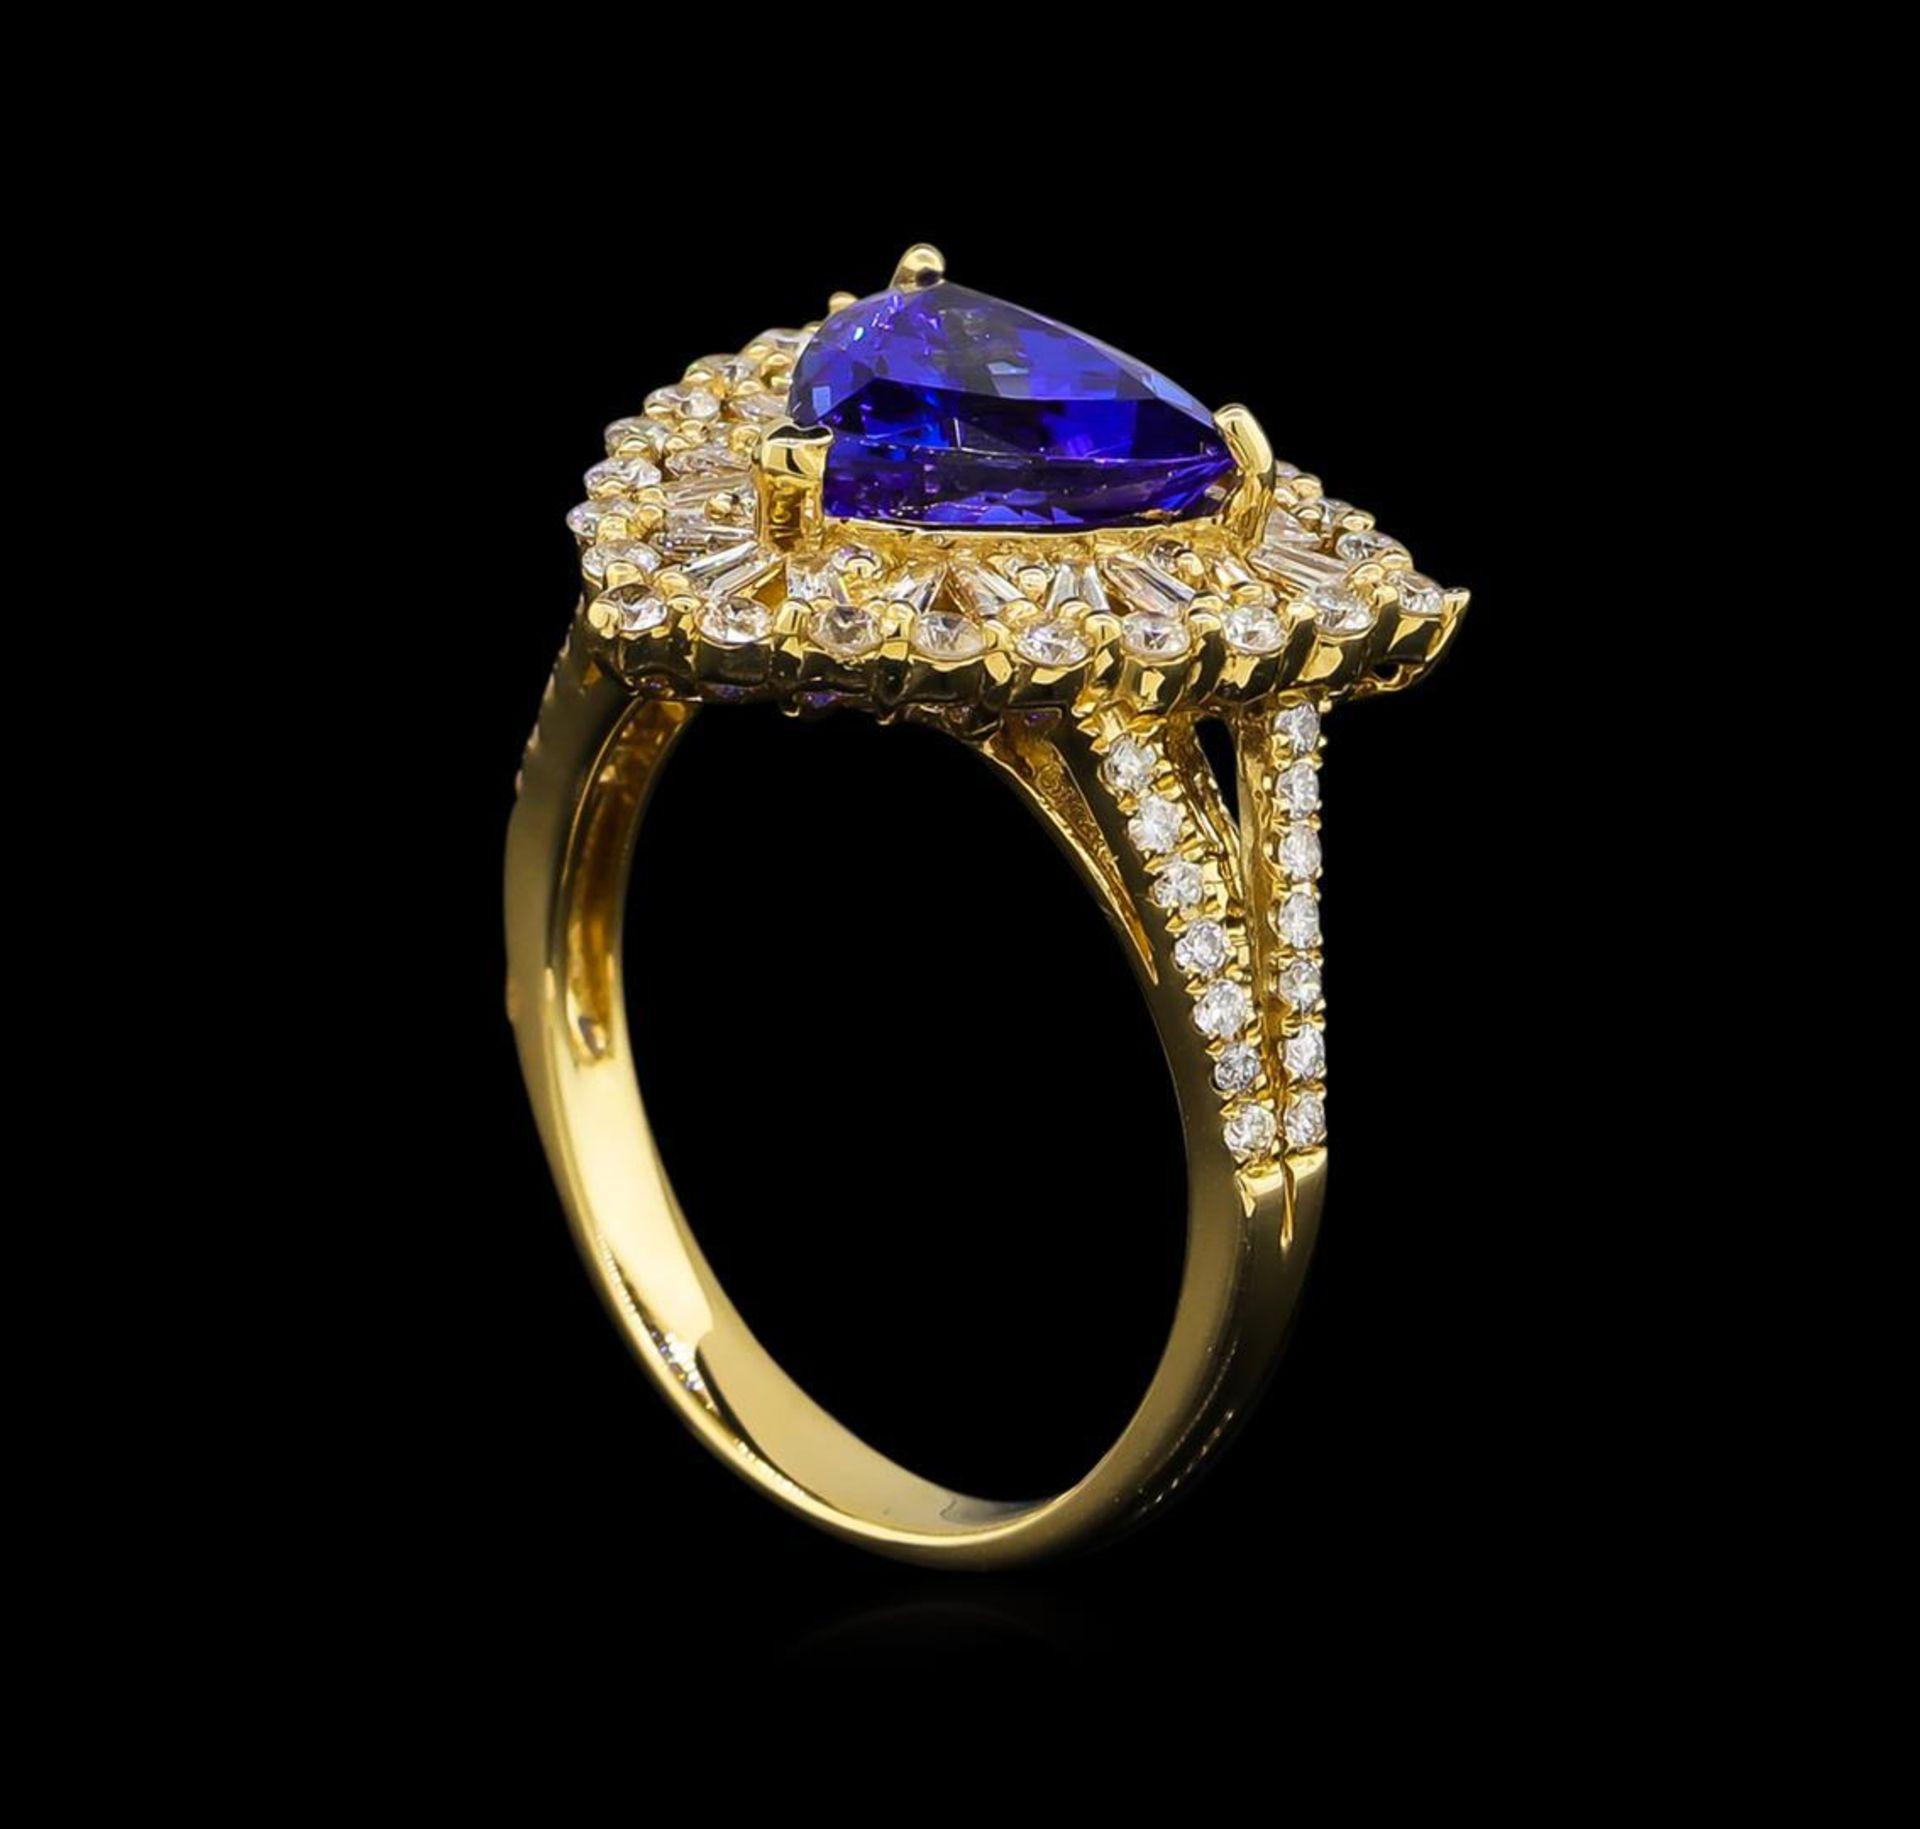 14KT Yellow Gold 2.86 ctw Tanzanite and Diamond Ring - Image 4 of 5